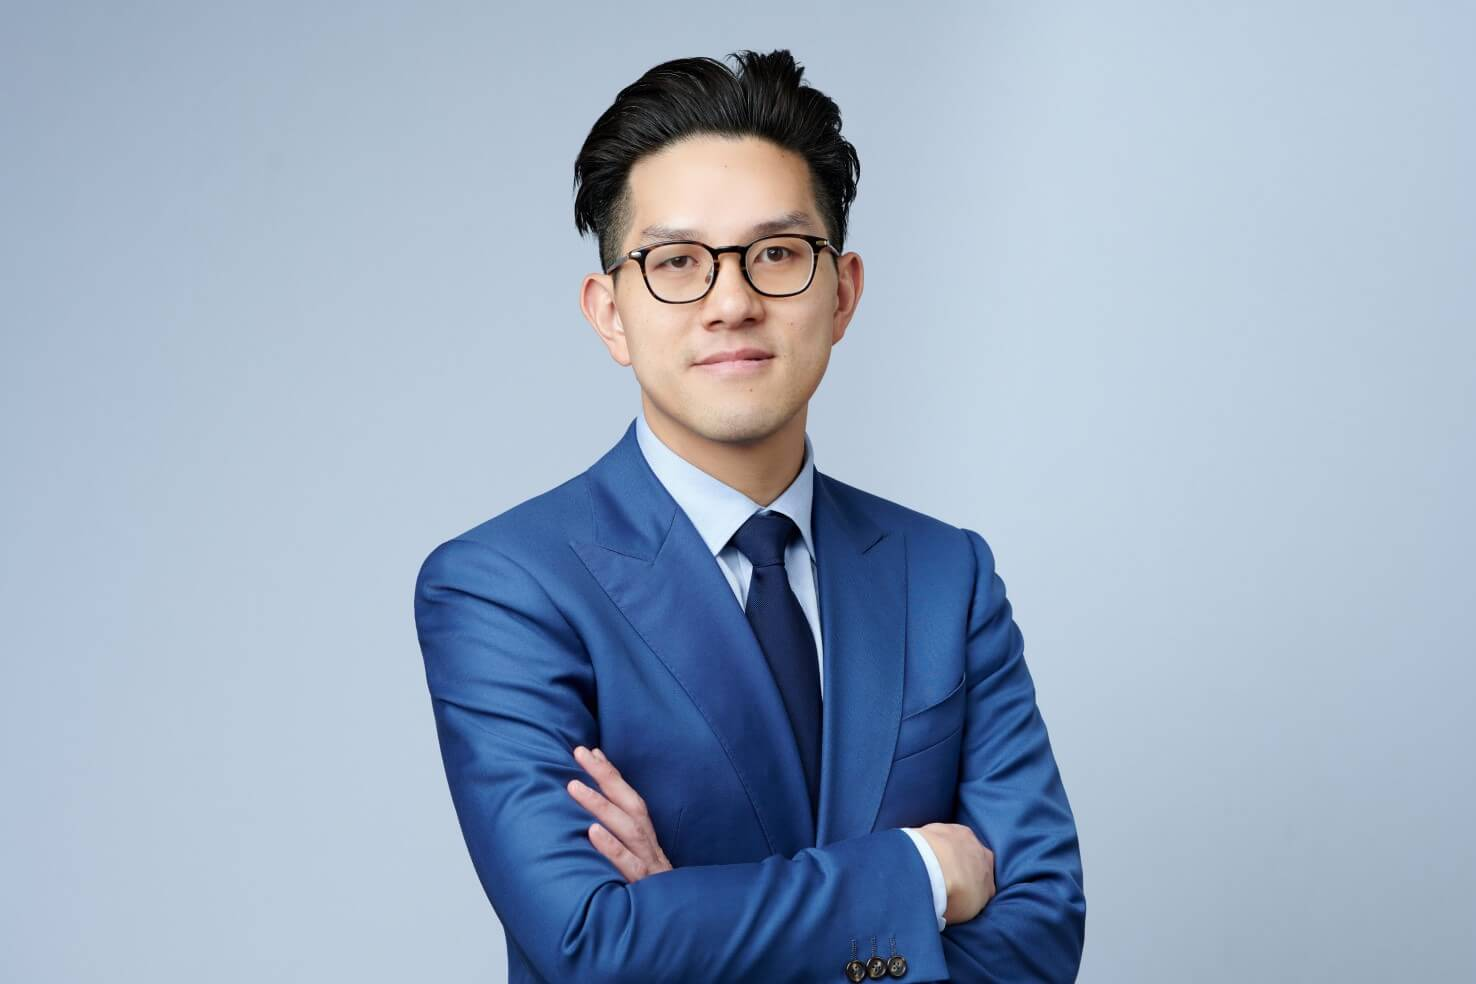 Dr. LUK Ngai Hong, Vincent profile image